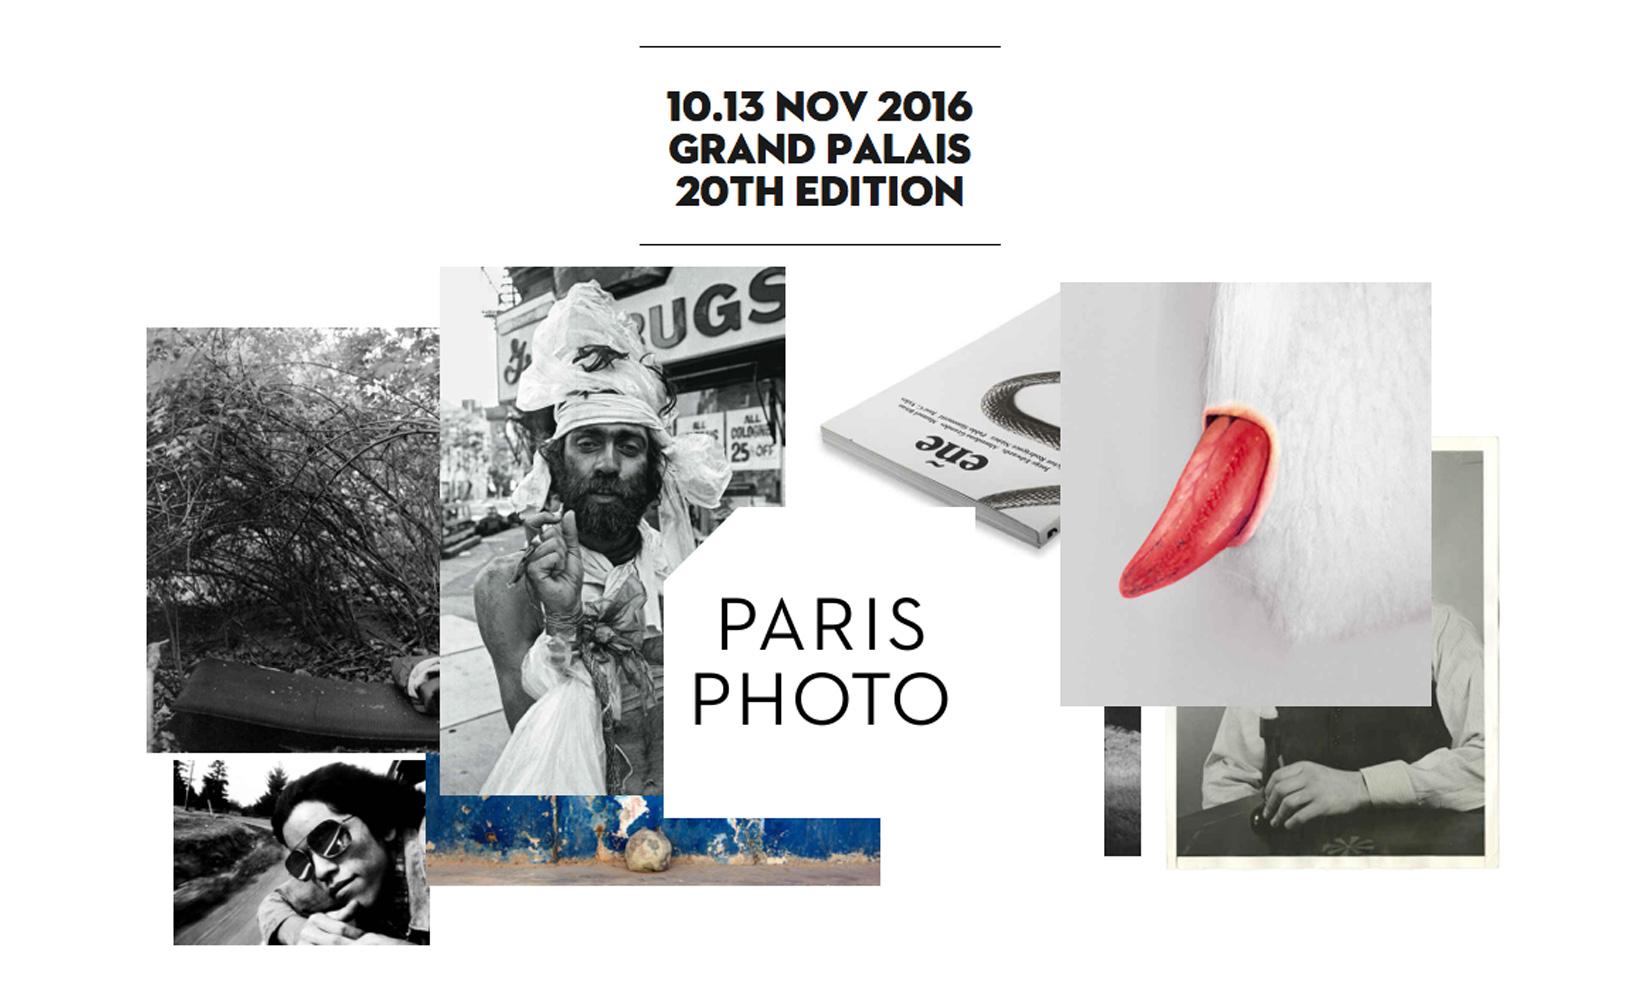 paris-photo-2016.jpg